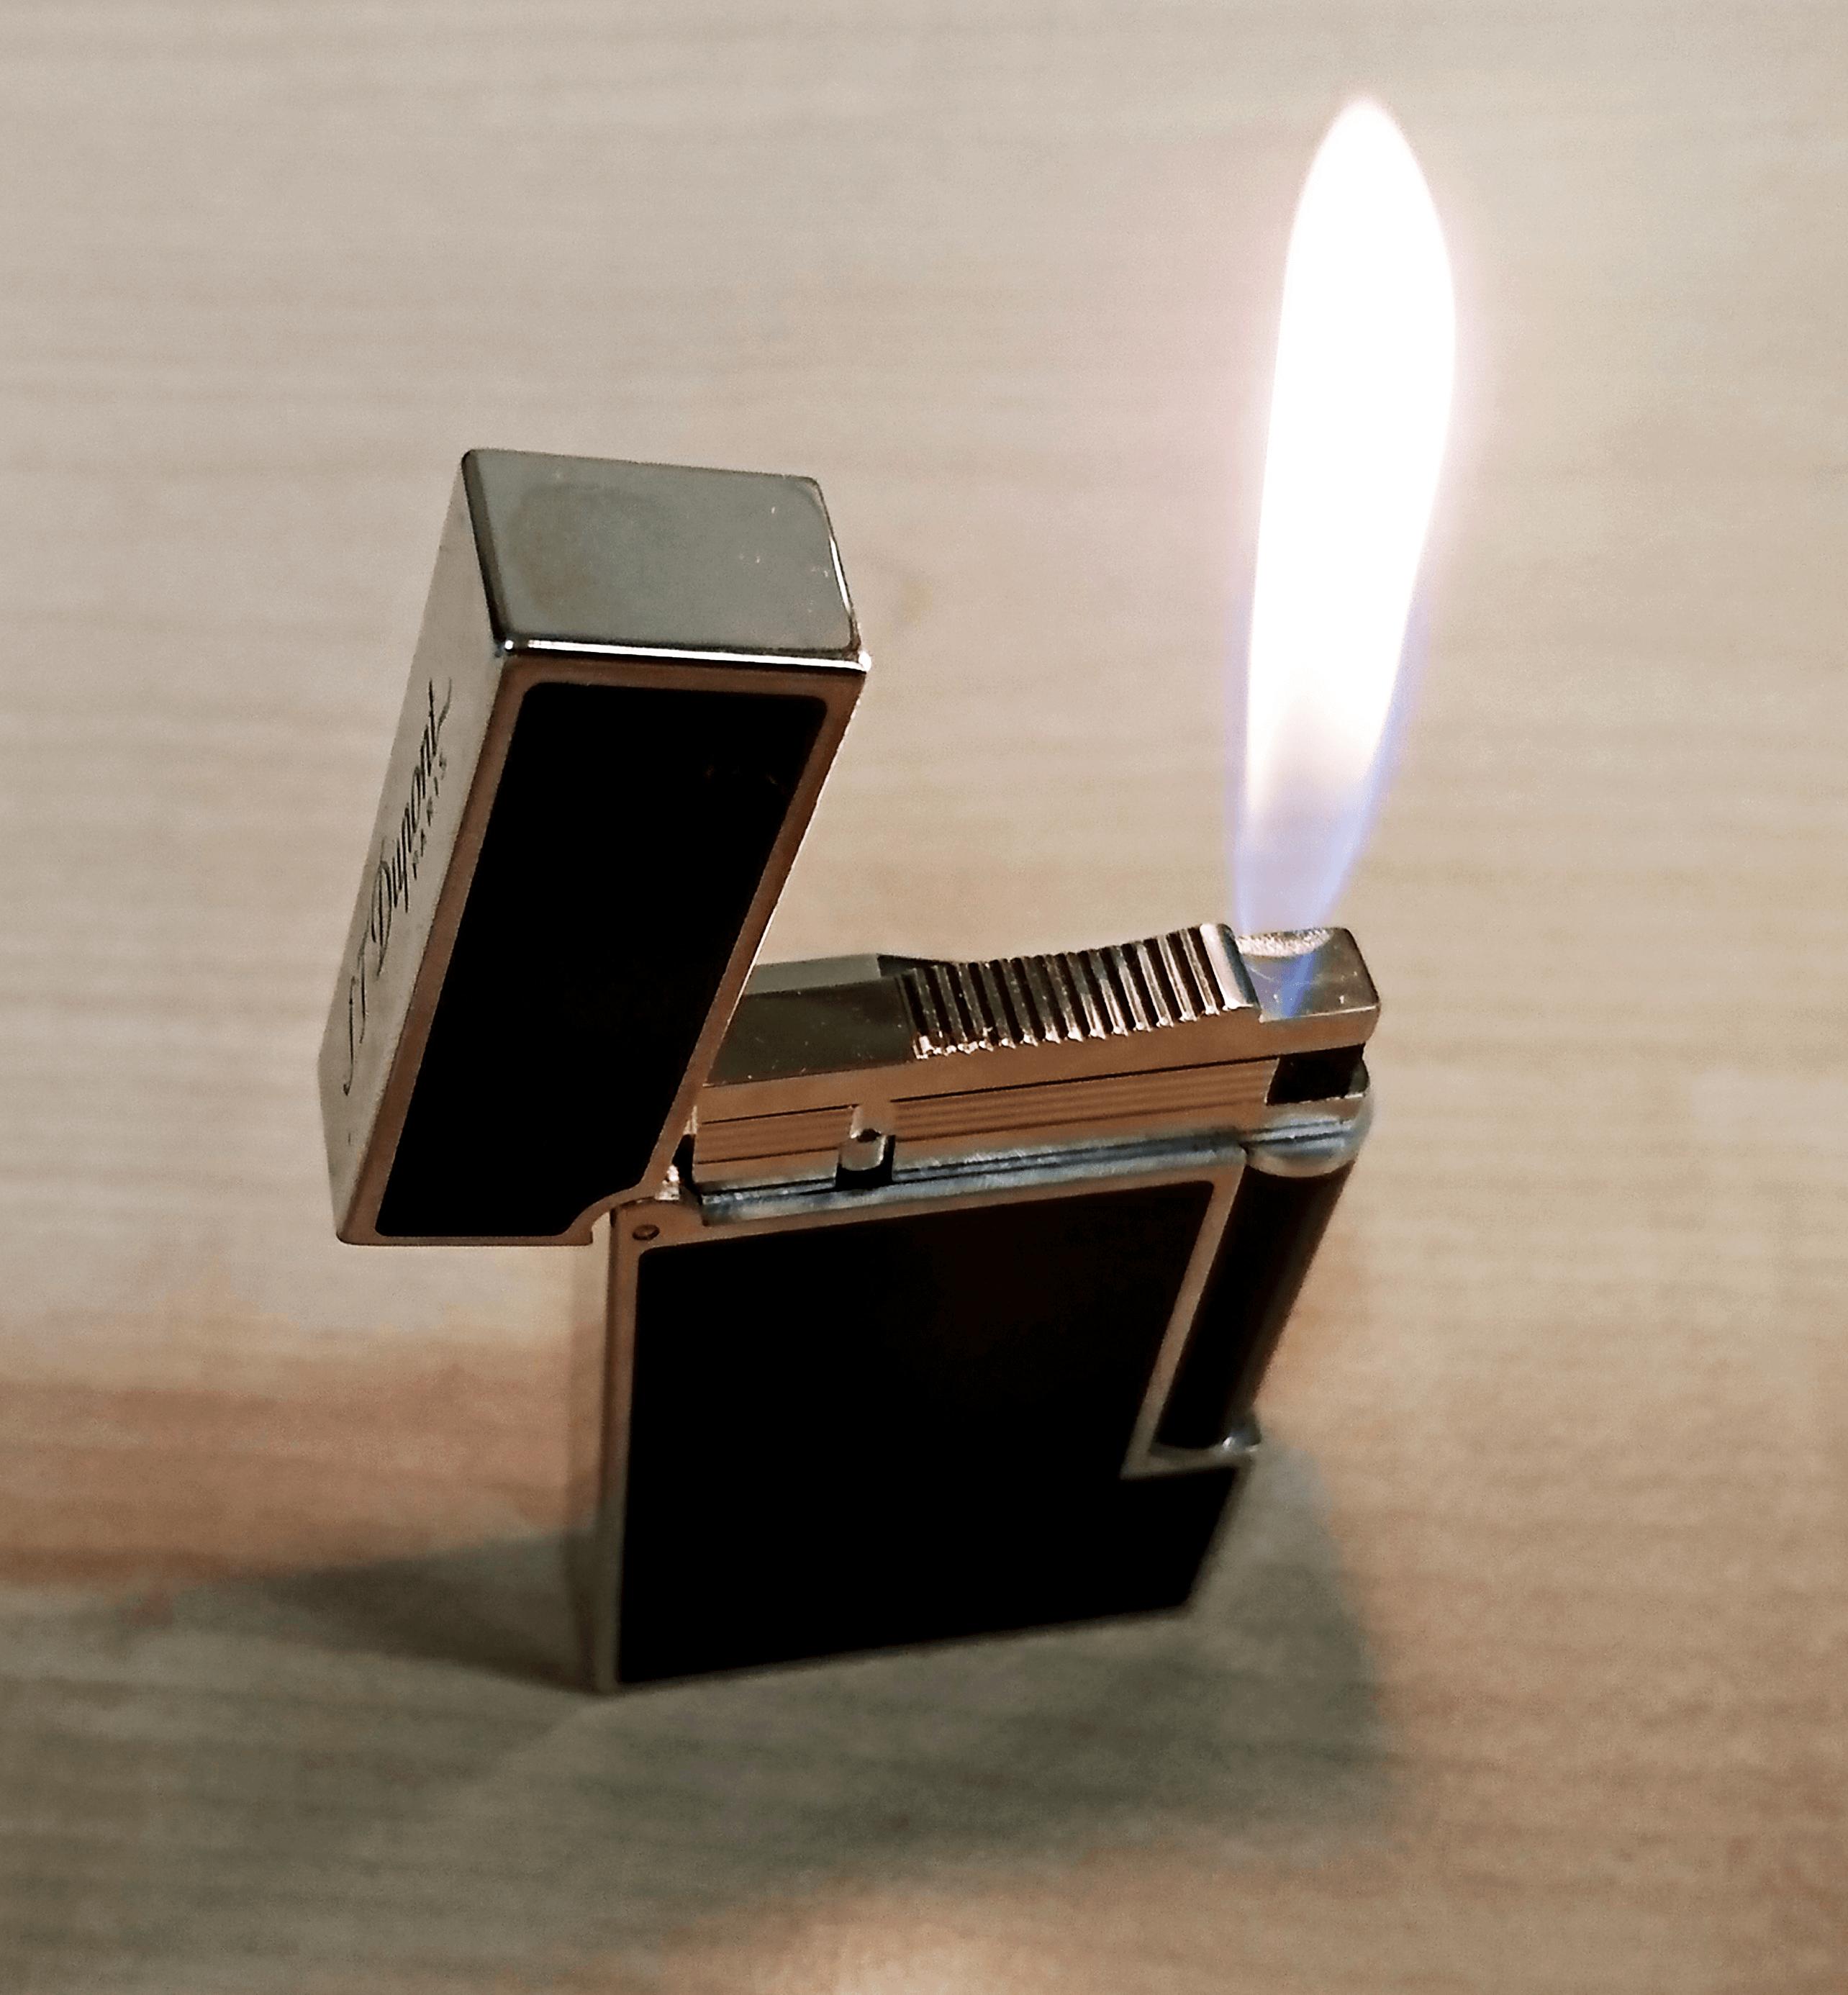 Feuerzeug6